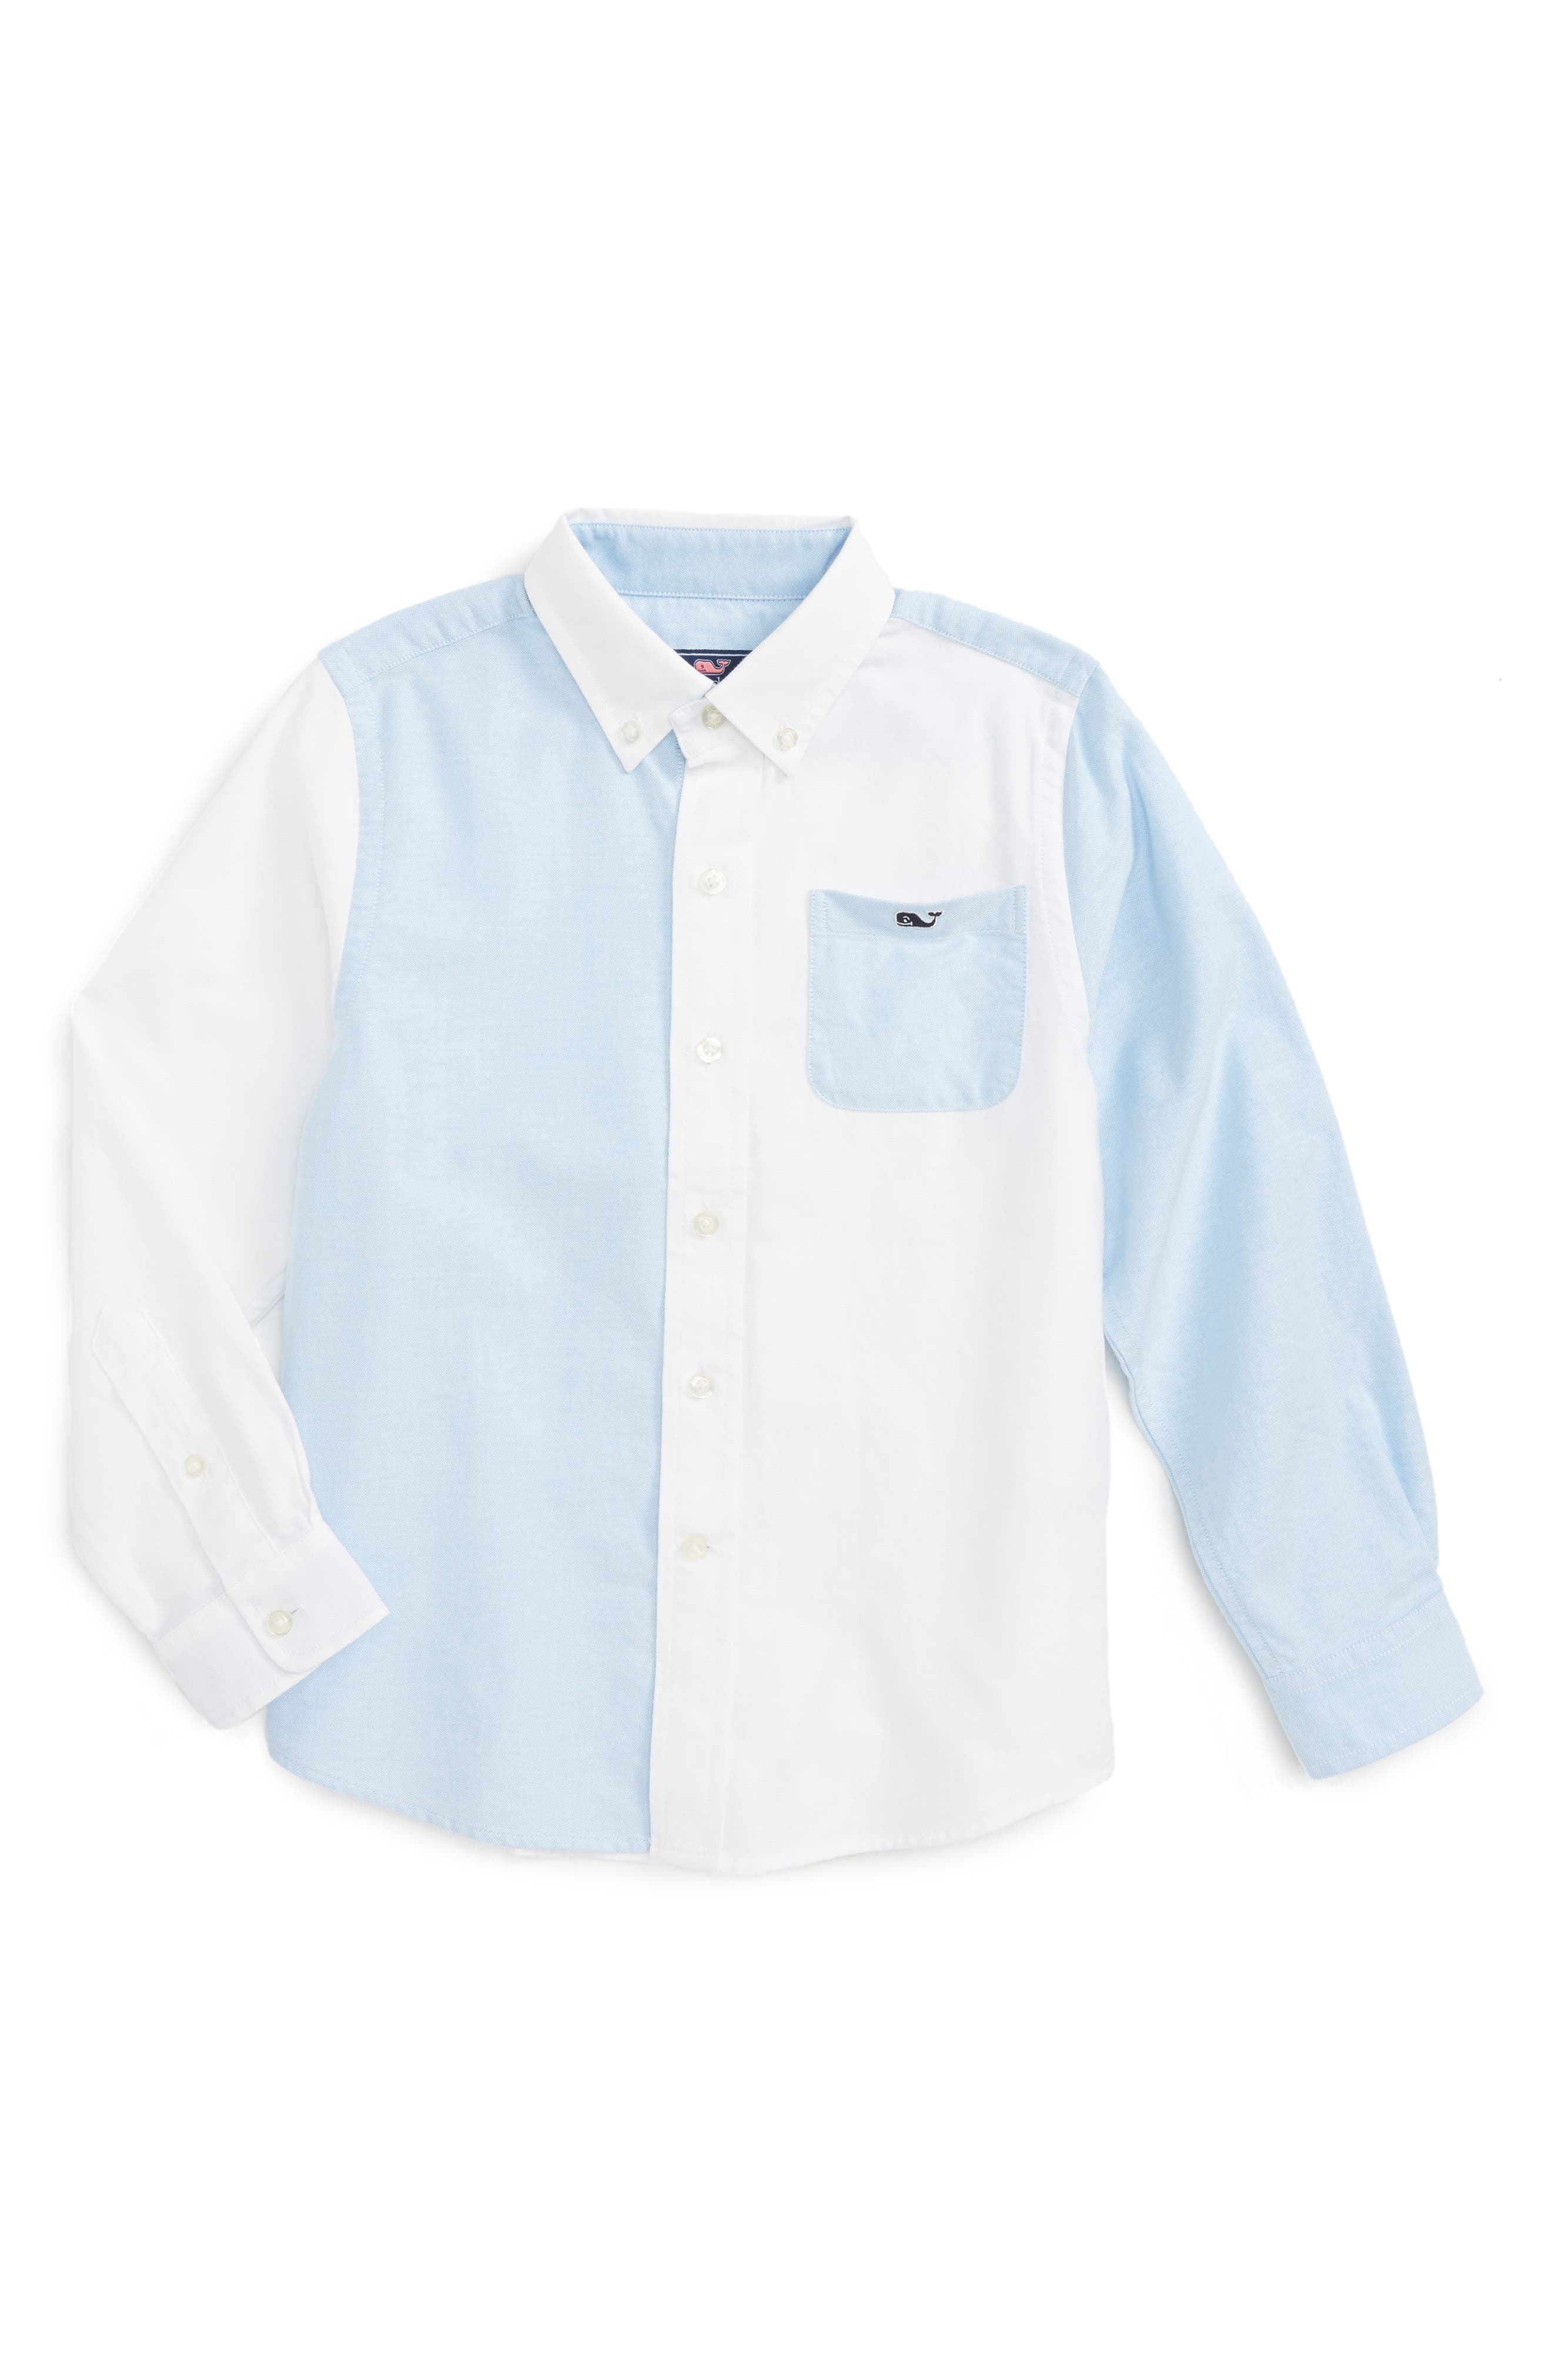 Vineyard Vines Party Whale Oxford Shirt (Toddler Boys & Little Boys)